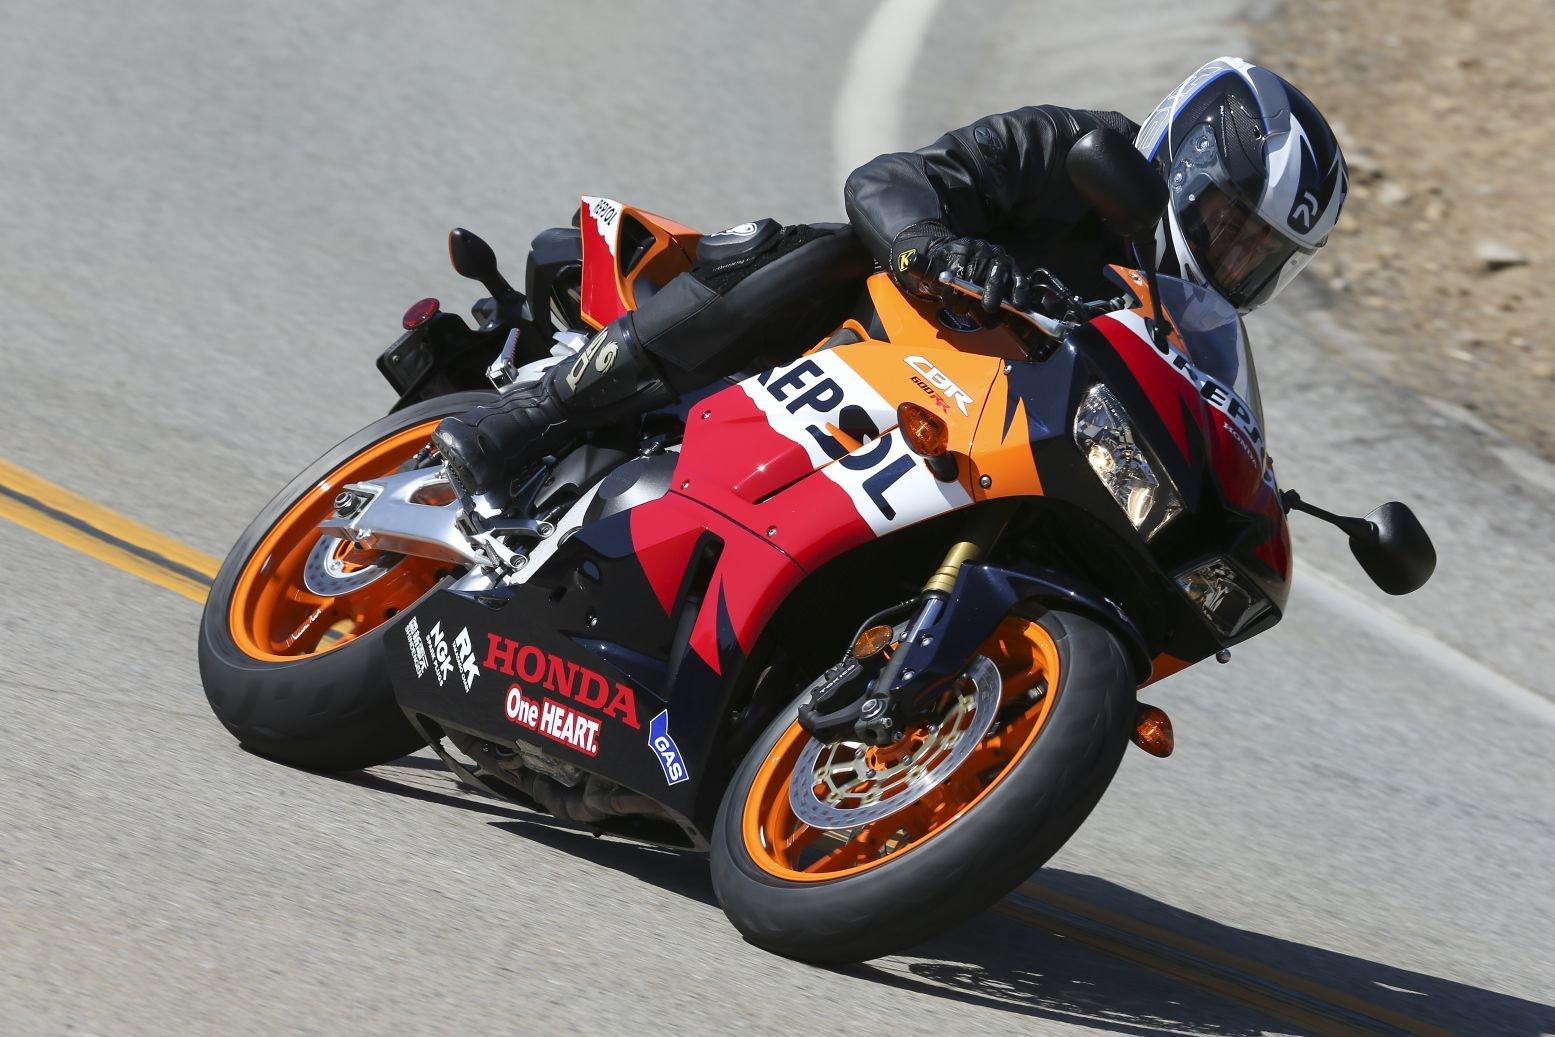 11 Defining Characteristics of a Honda Sportbike